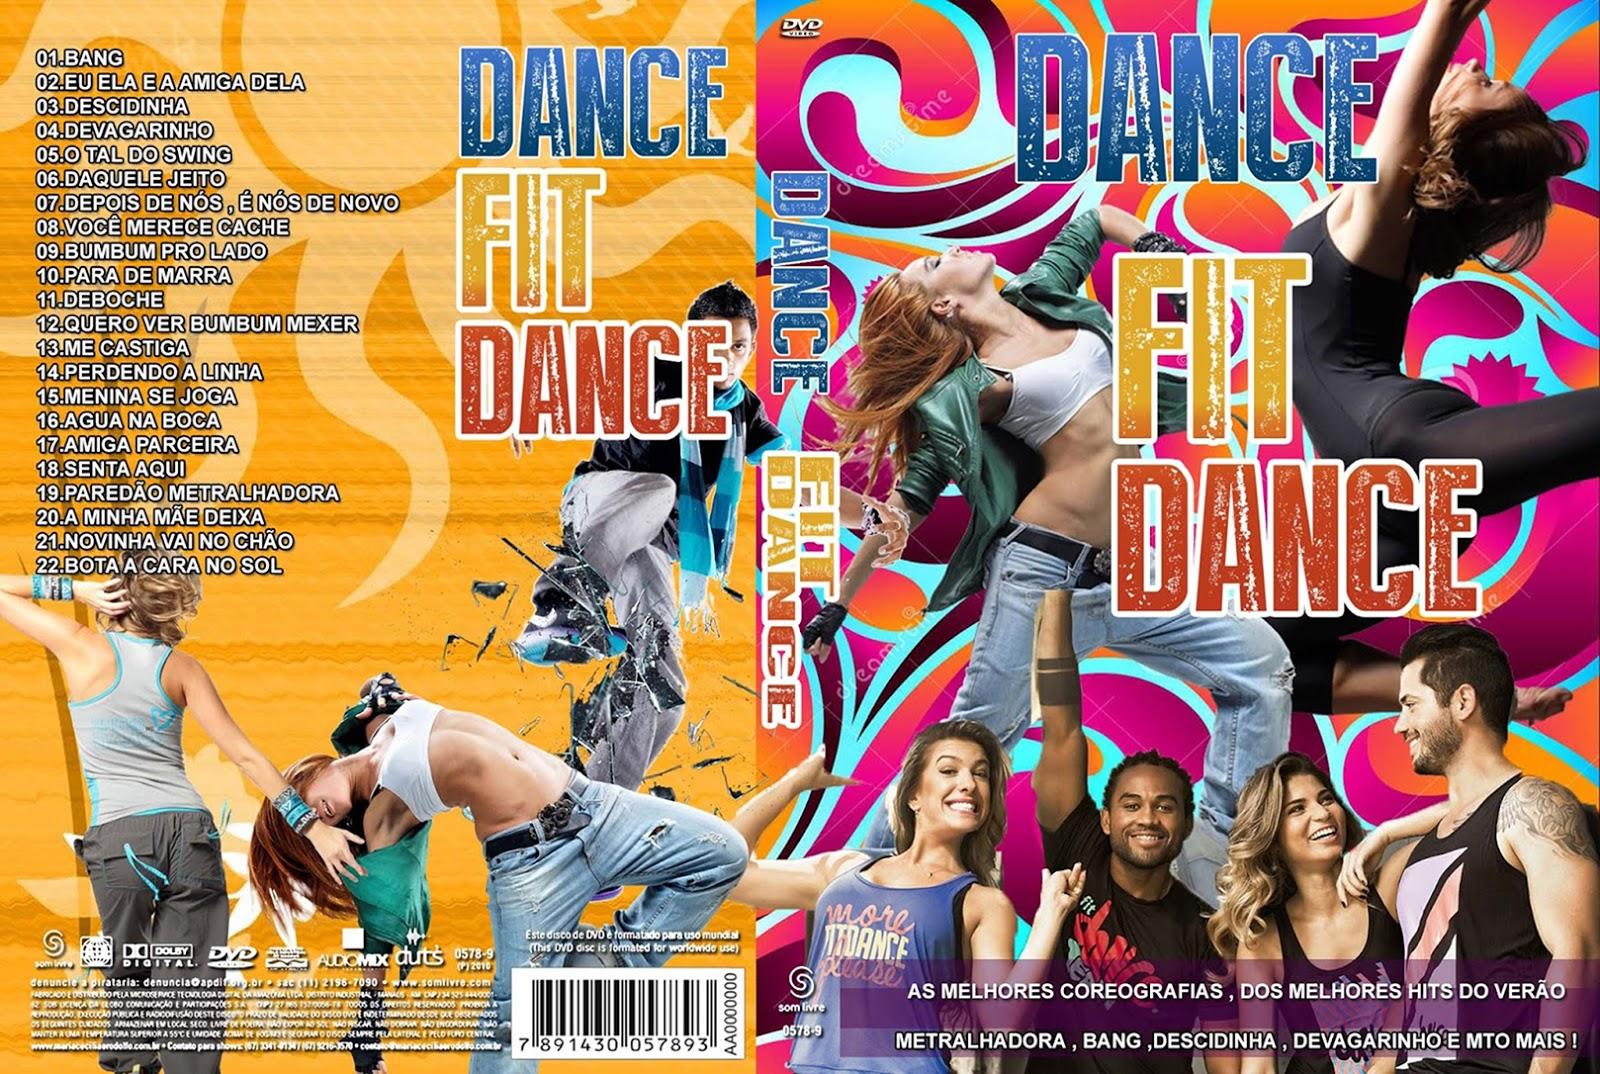 Dance Fit Dance DVDRip + DVD-R Dance 2BFit 2BDance 2BDVD R 2B  2BXANDAODOWNLOAD